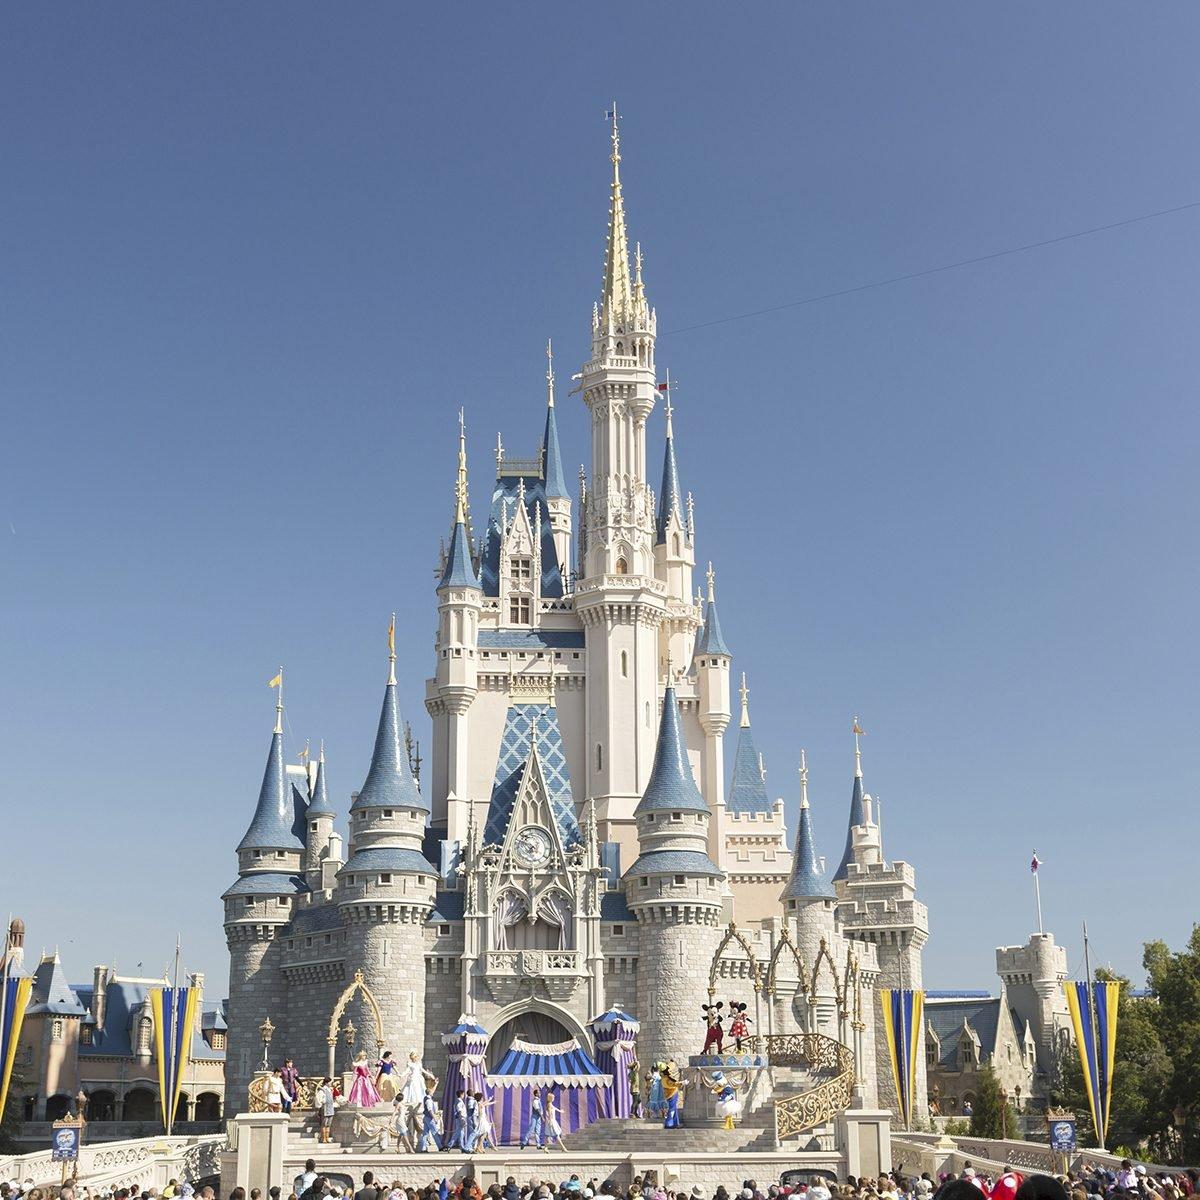 Cinderella Castle in the Magic Kingdom, Walt Disney World Resort